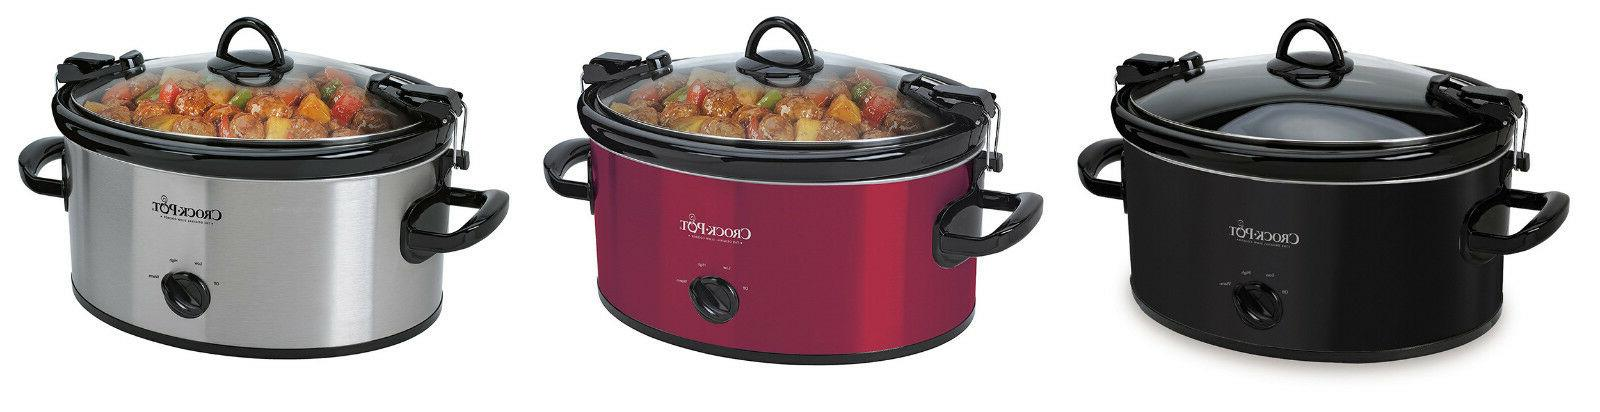 crock pot sccpvl600 cook n carry 6